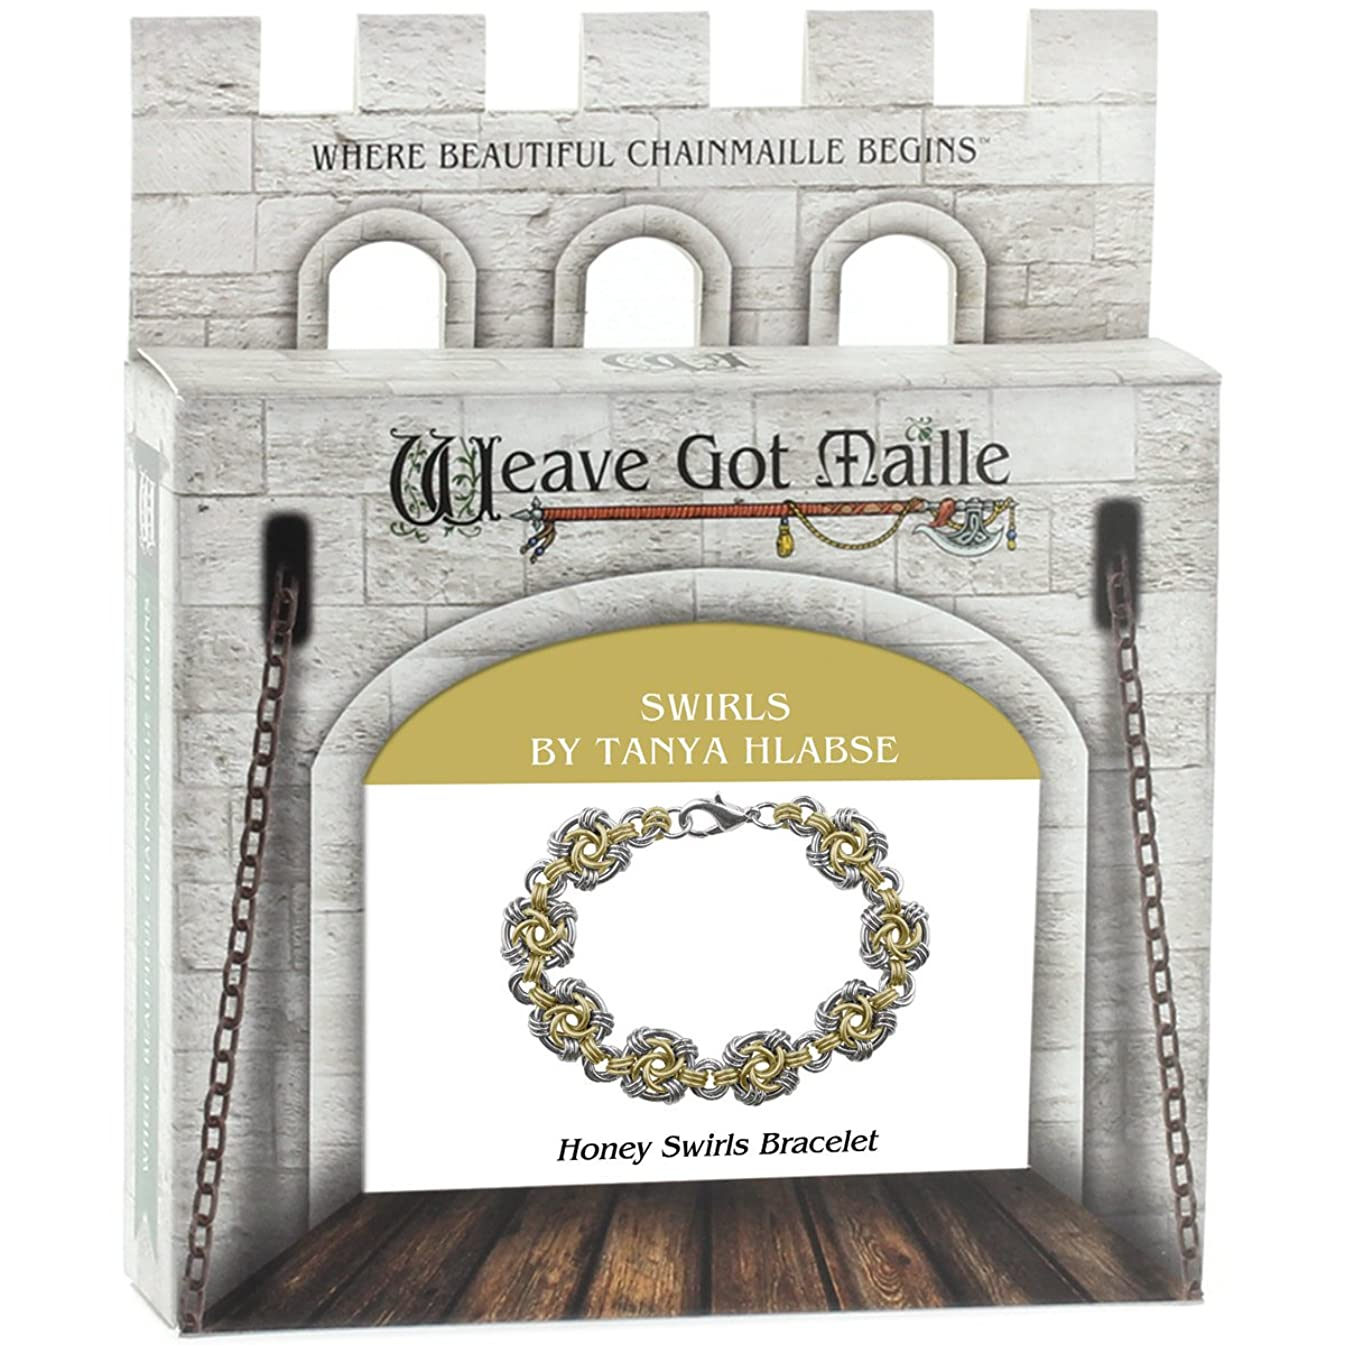 Weave Got Maille Honey Swirls Chain Maille Bracelet Kit